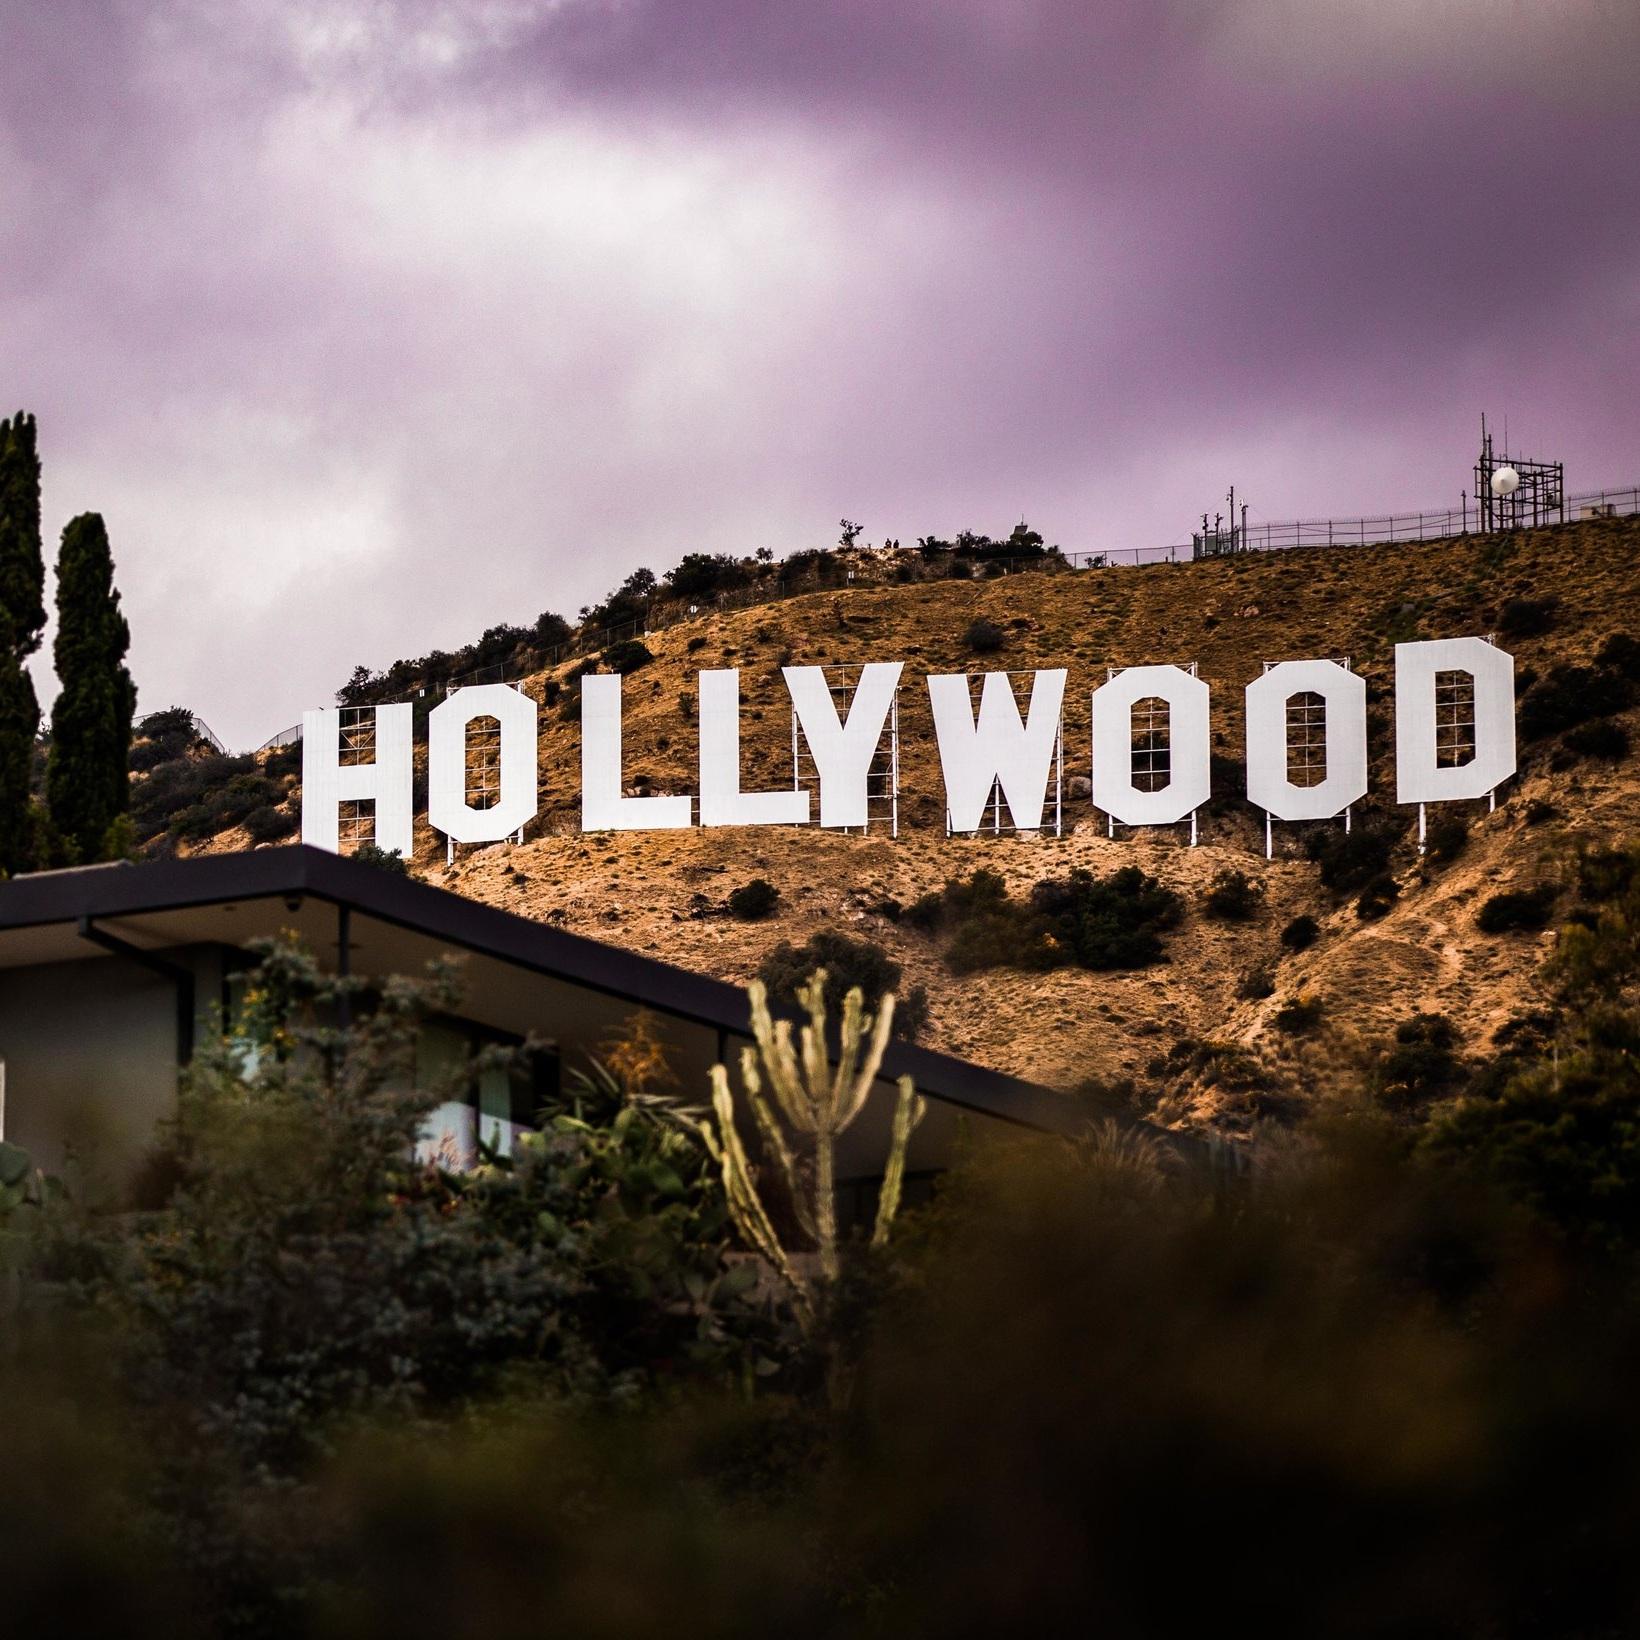 Brand Films / Originals - Tell stories using the language of cinema.